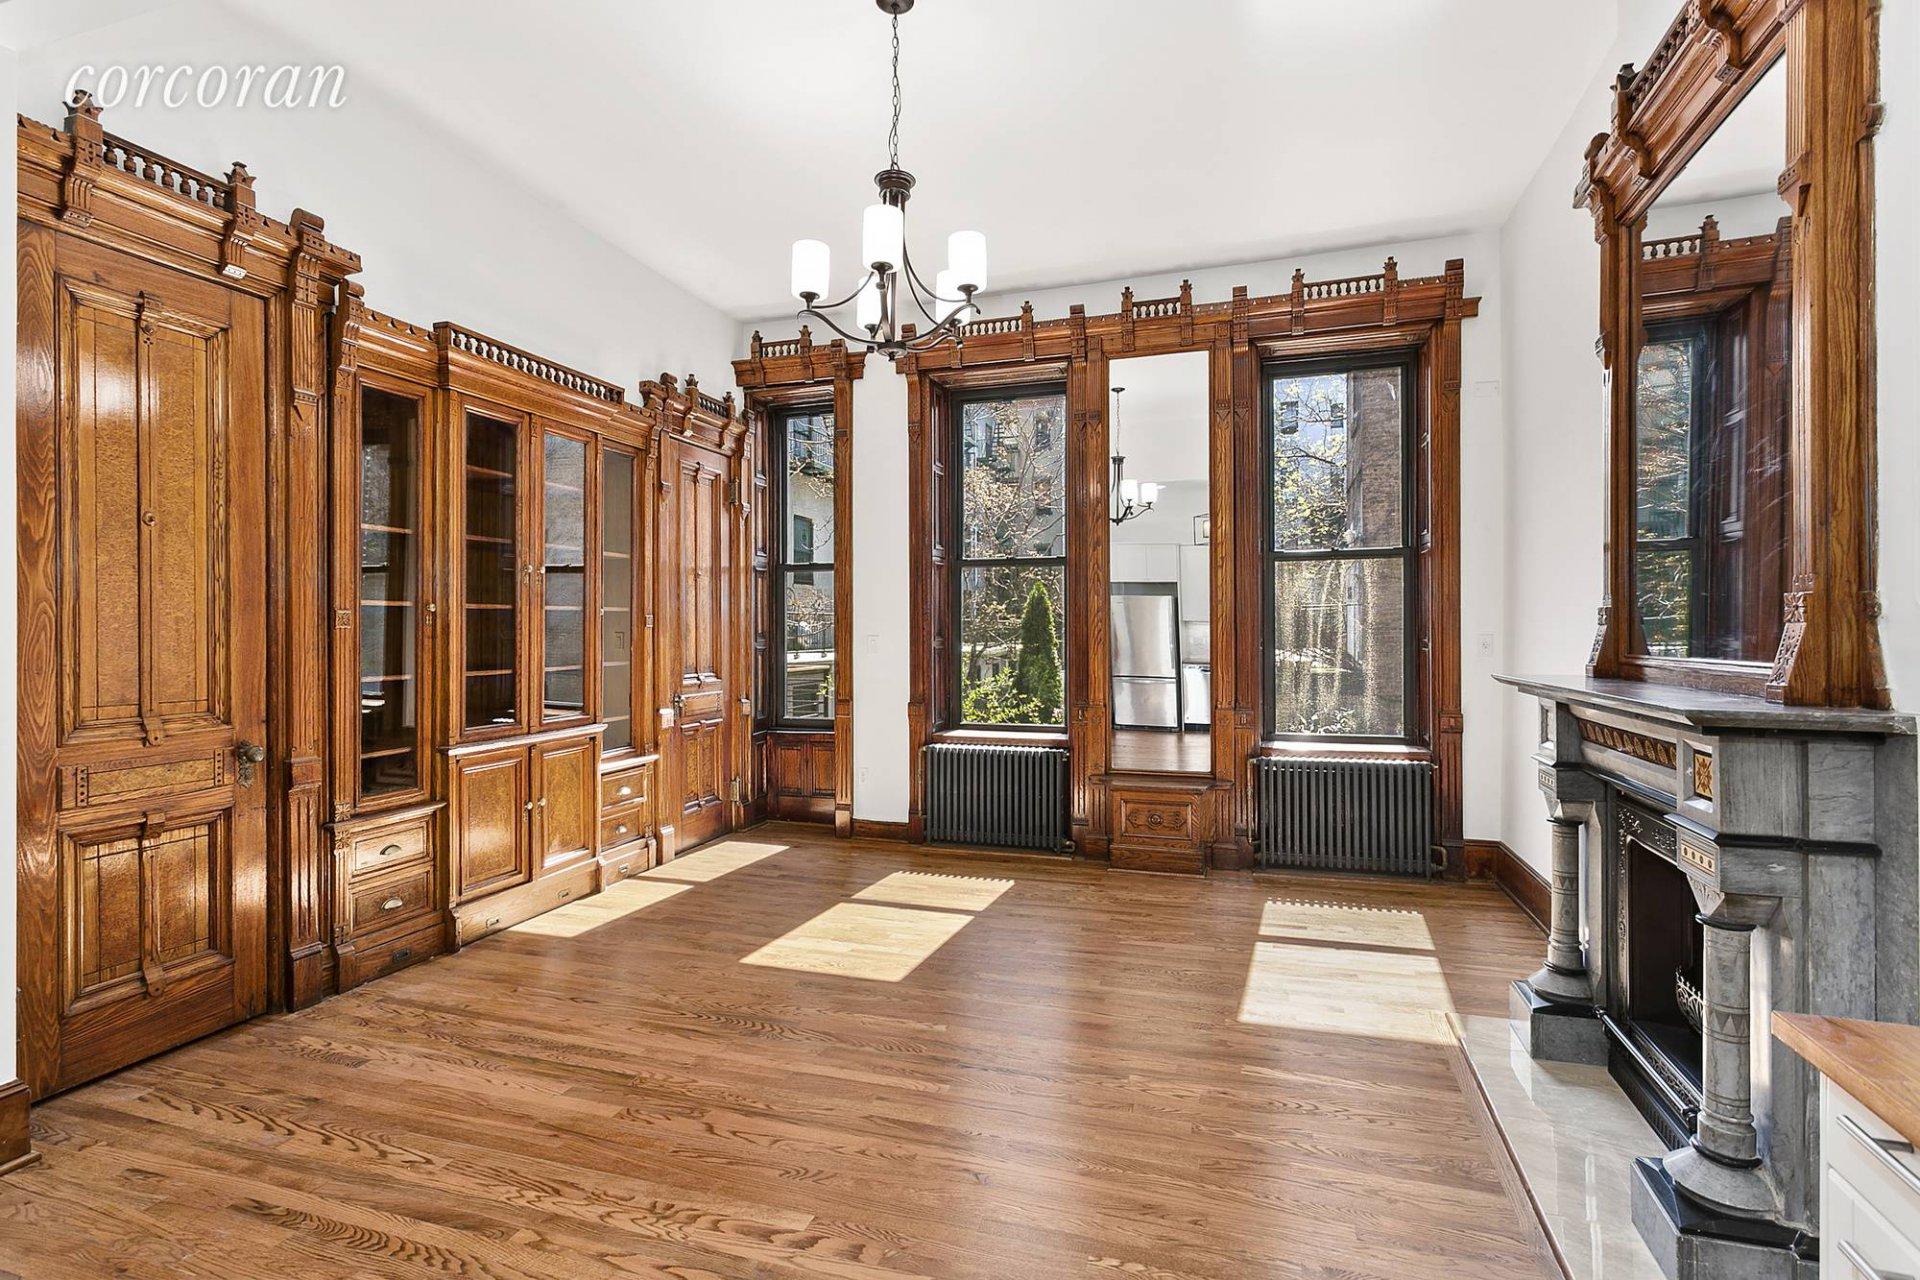 Ad Rental Apartment New York (10035) ref:5729783